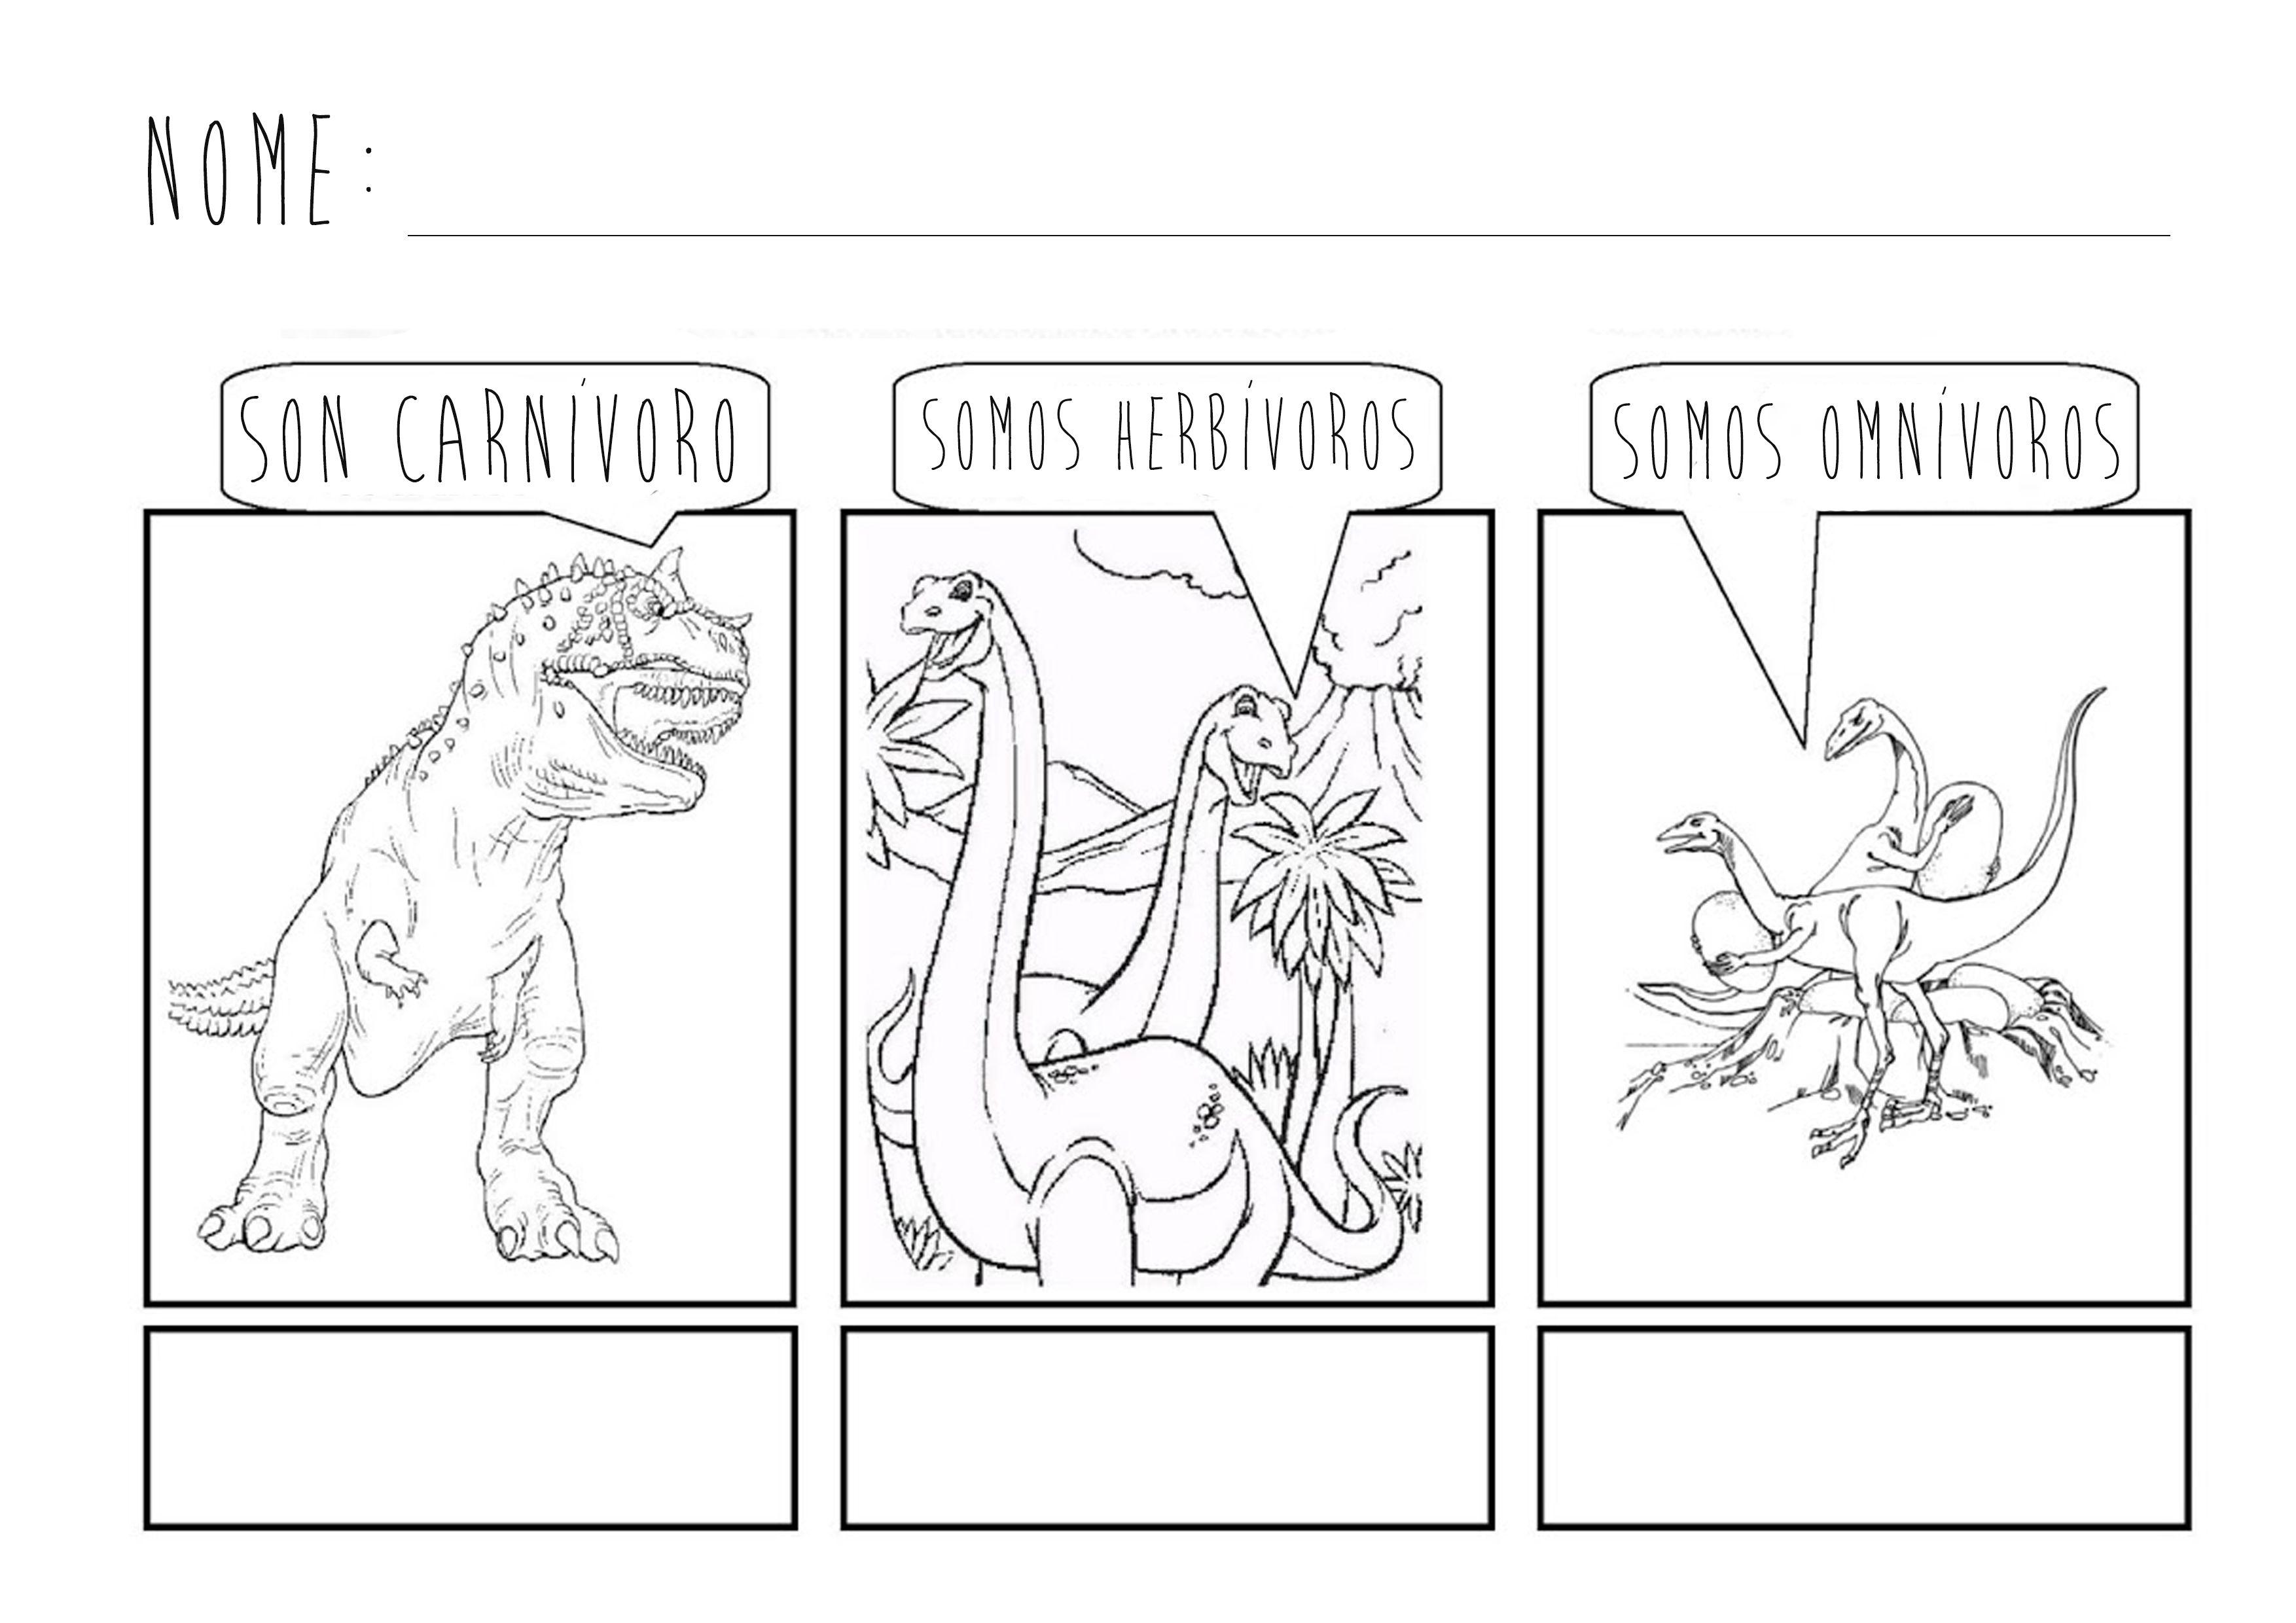 Proyecto Dinosaurio Https Www Pinterest Com Dsentimiento Proyectos De Dinosaurios Actividades De Dinosaurios Dinosaurios